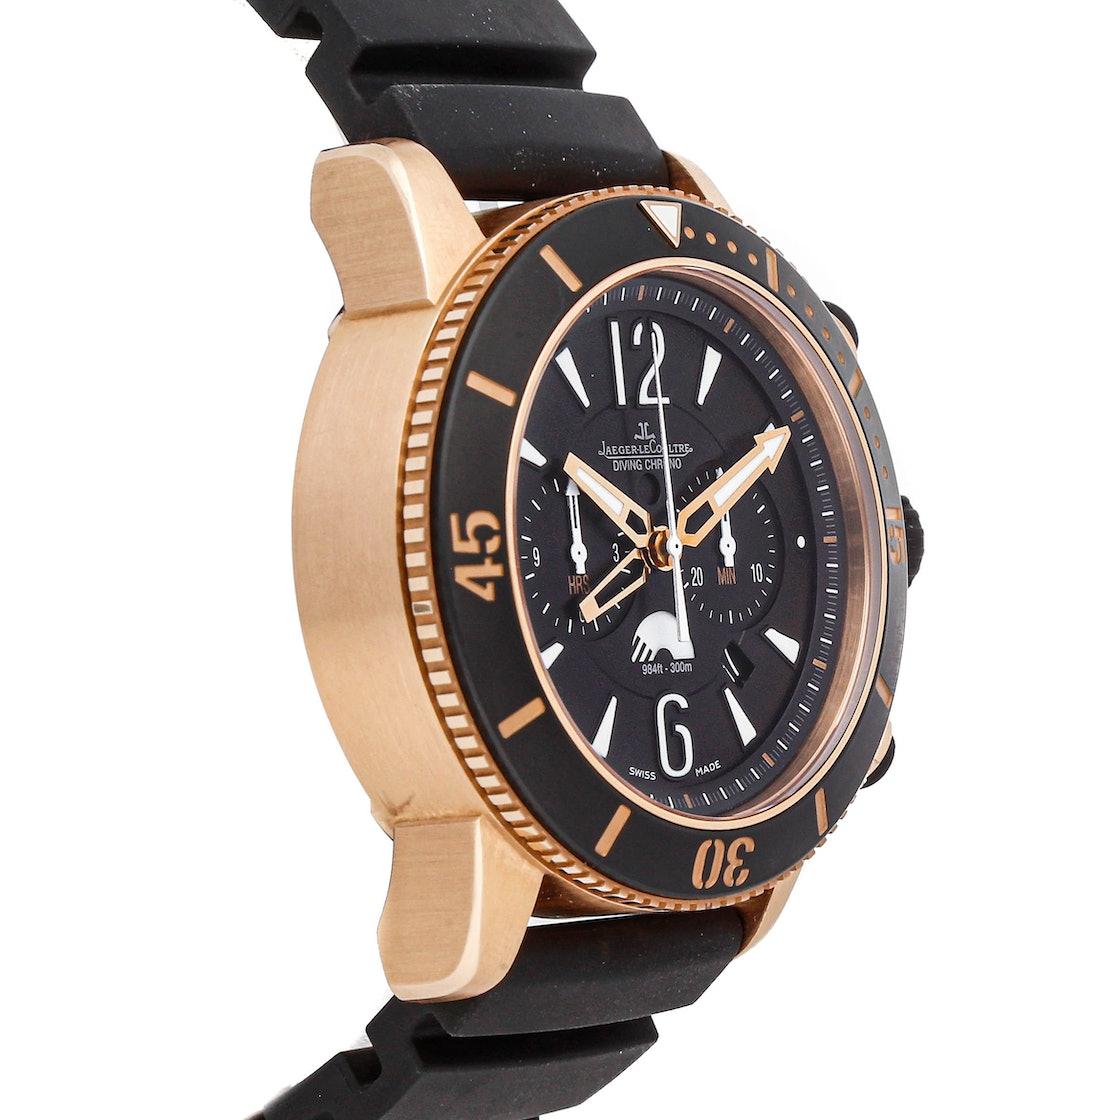 Jaeger-LeCoultre Master Compressor Diving Chronograph GMT Q1782670